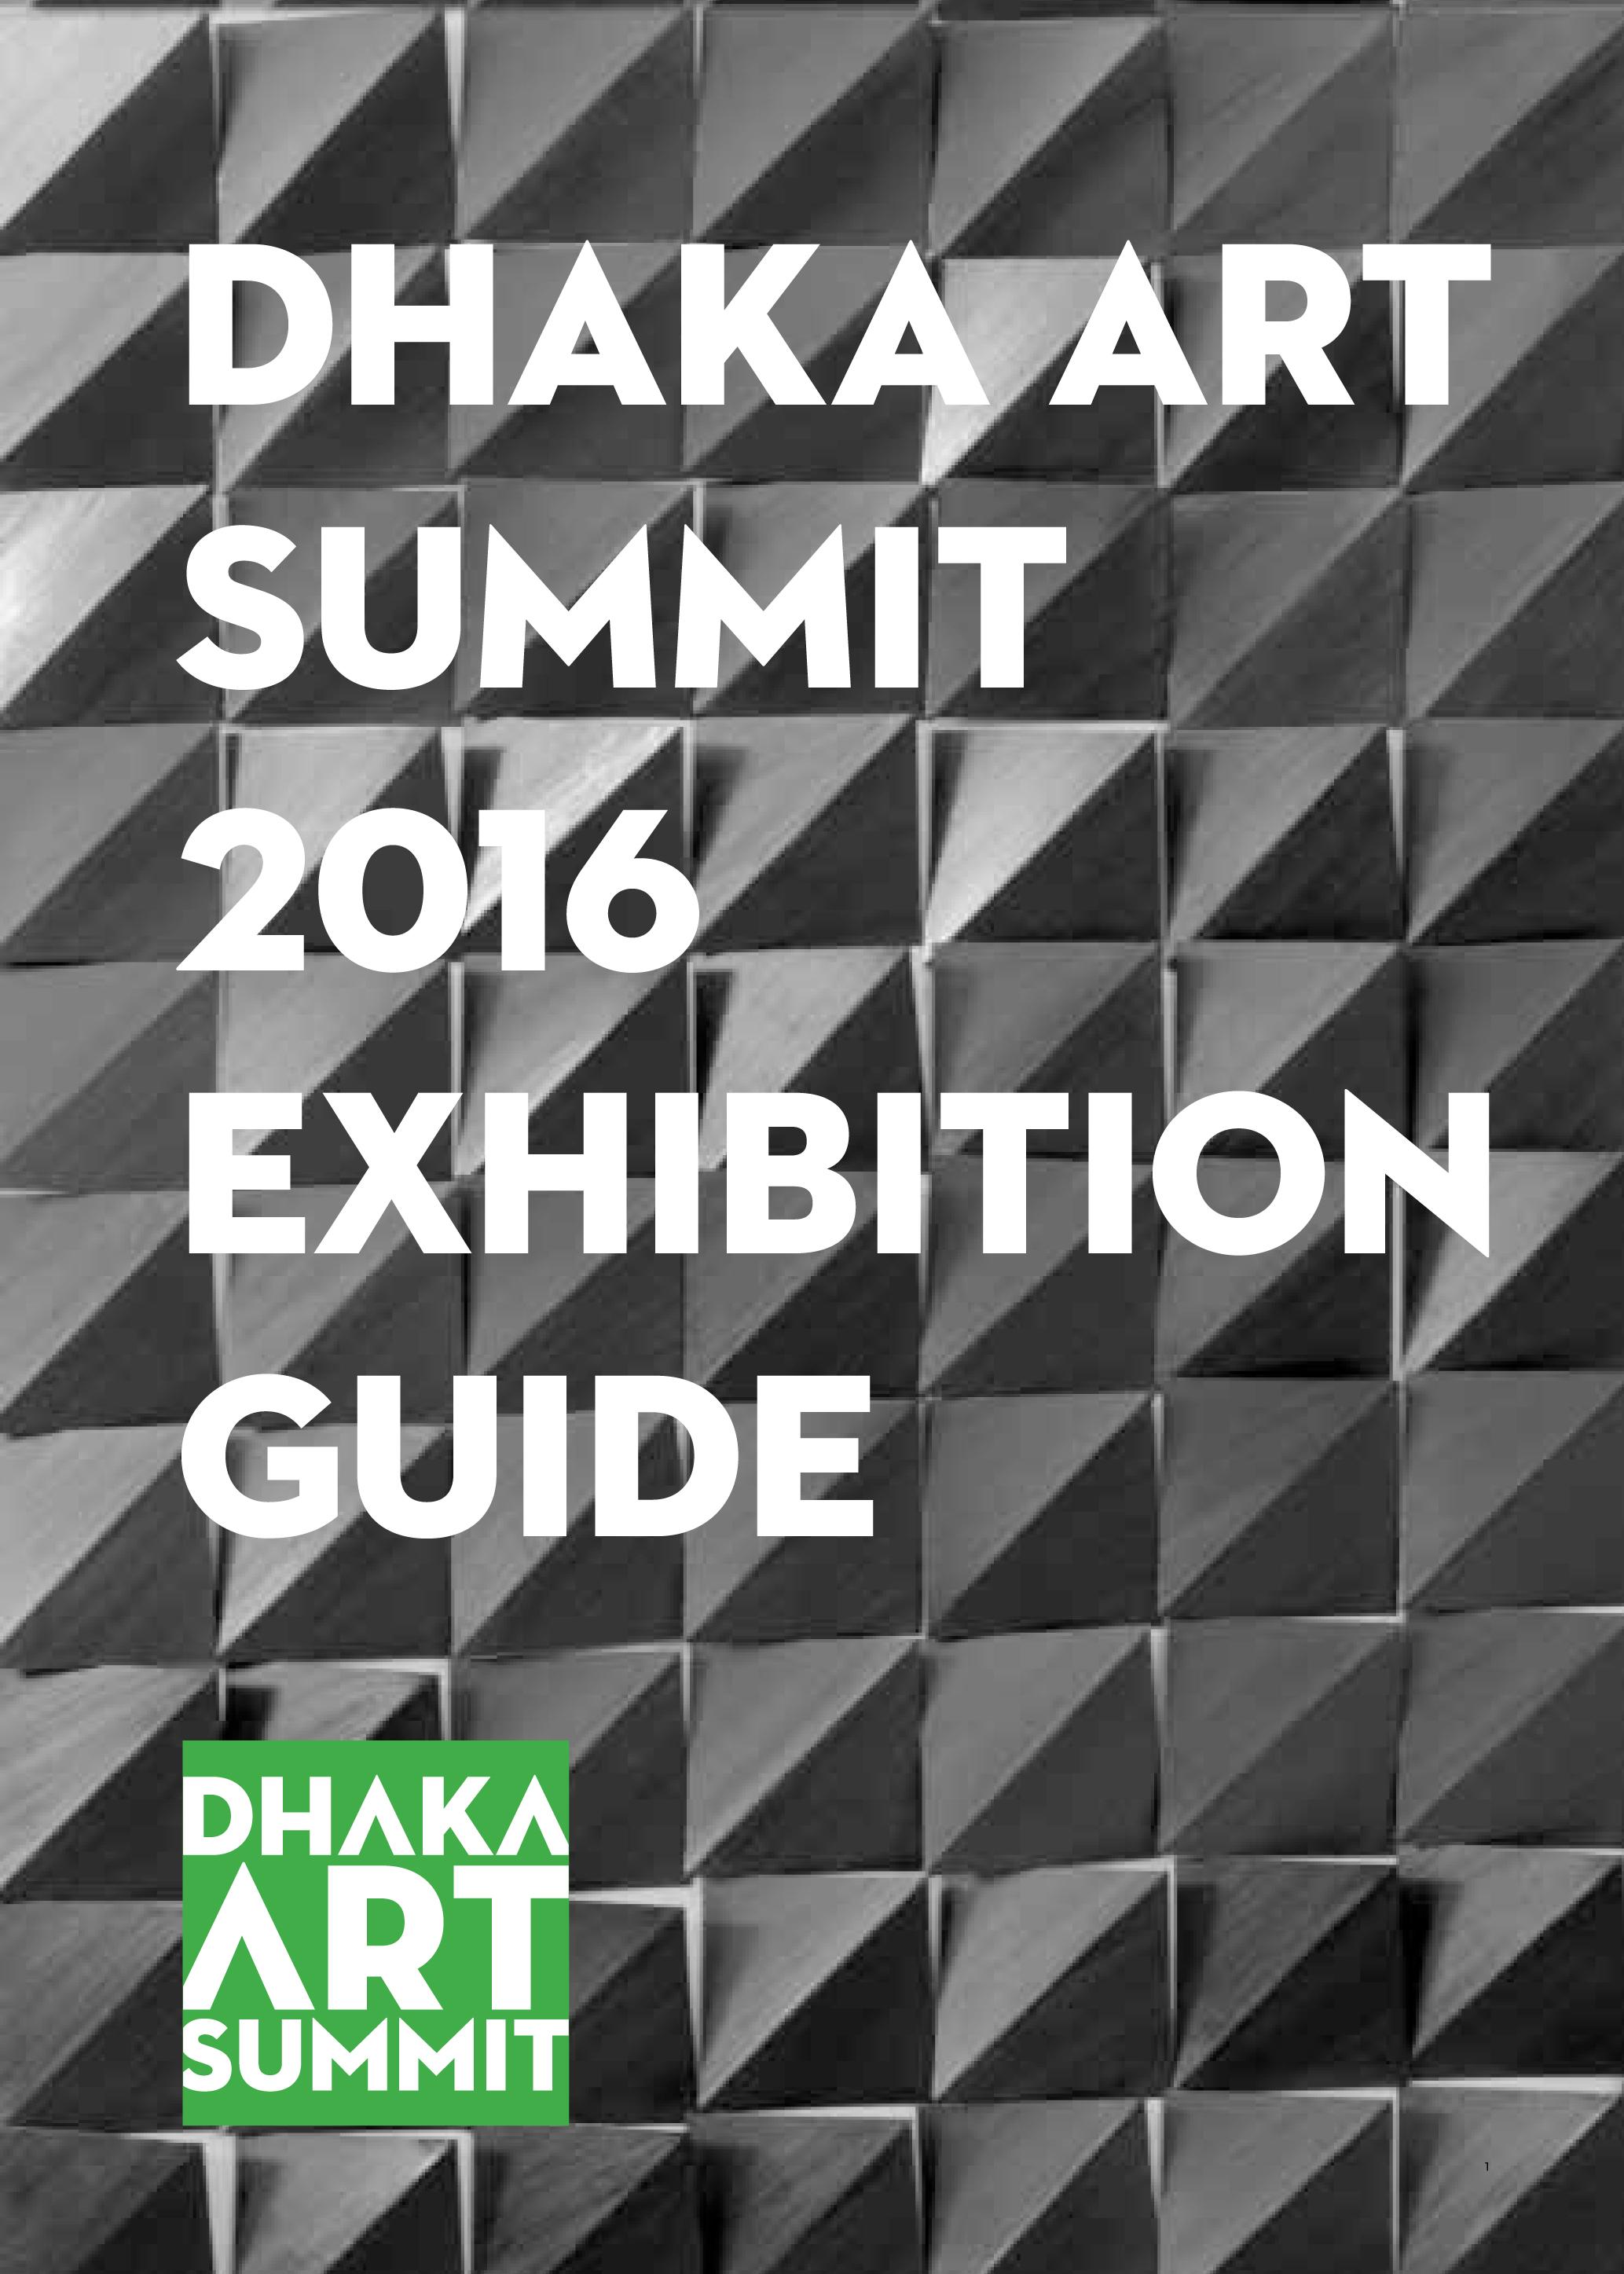 DAS 2016 Exhibition Guide